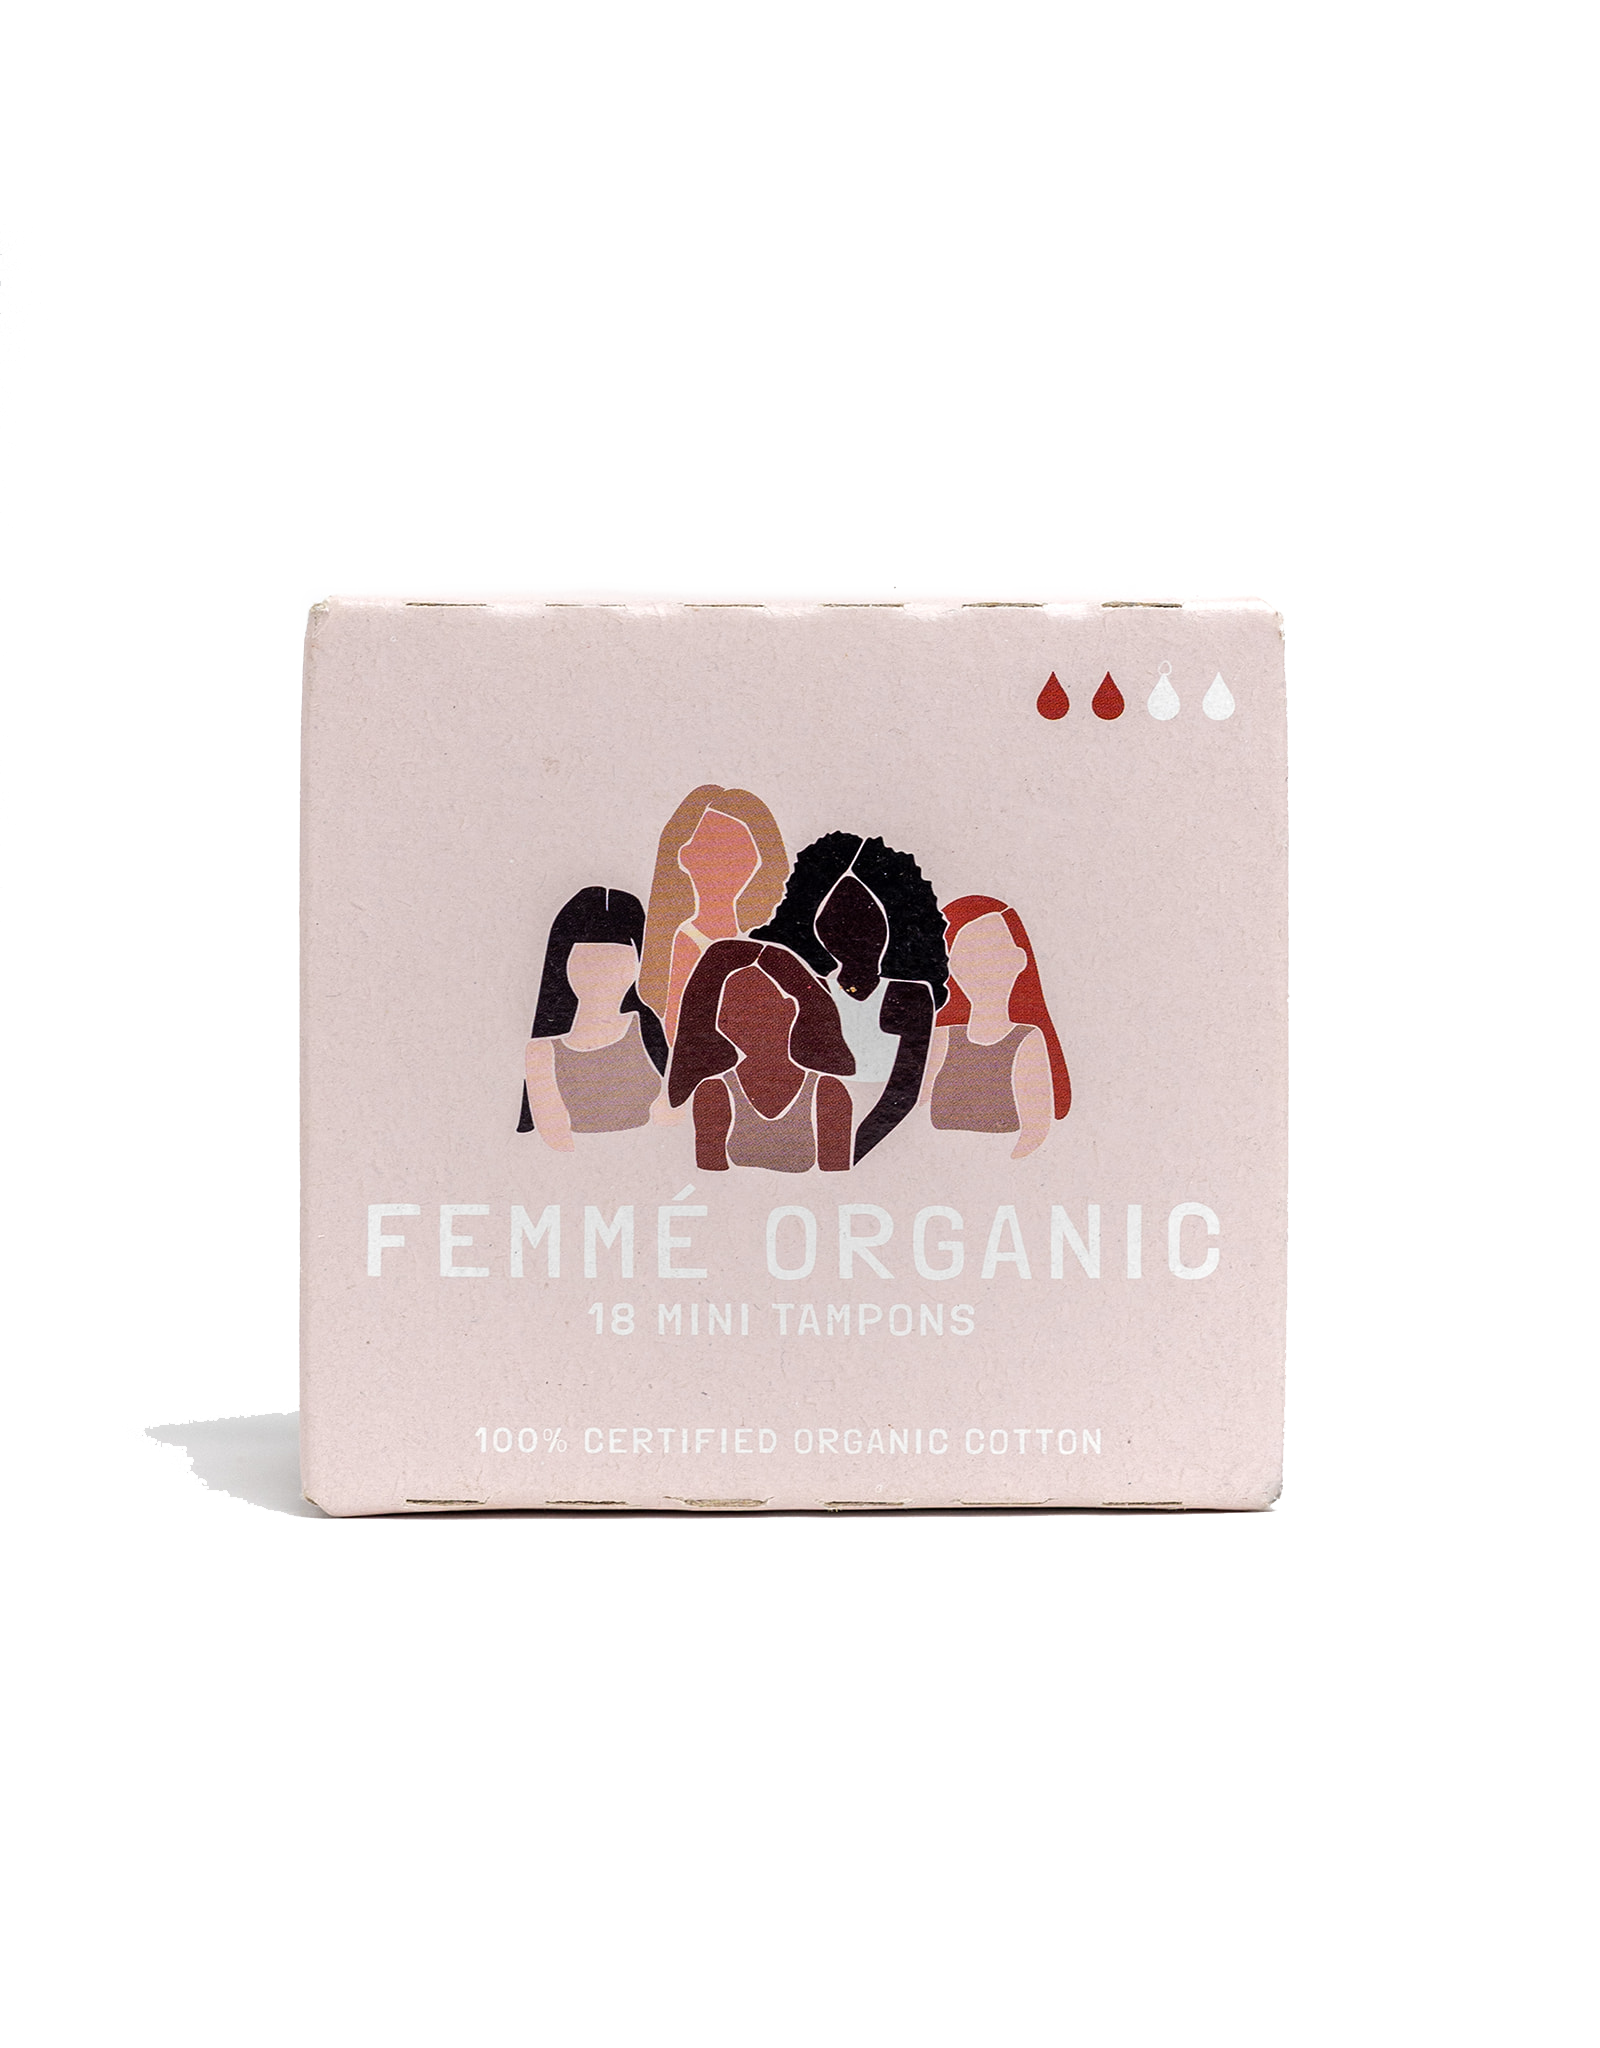 Femme Organic Organic Cotton Tampons - Mini (18pc)